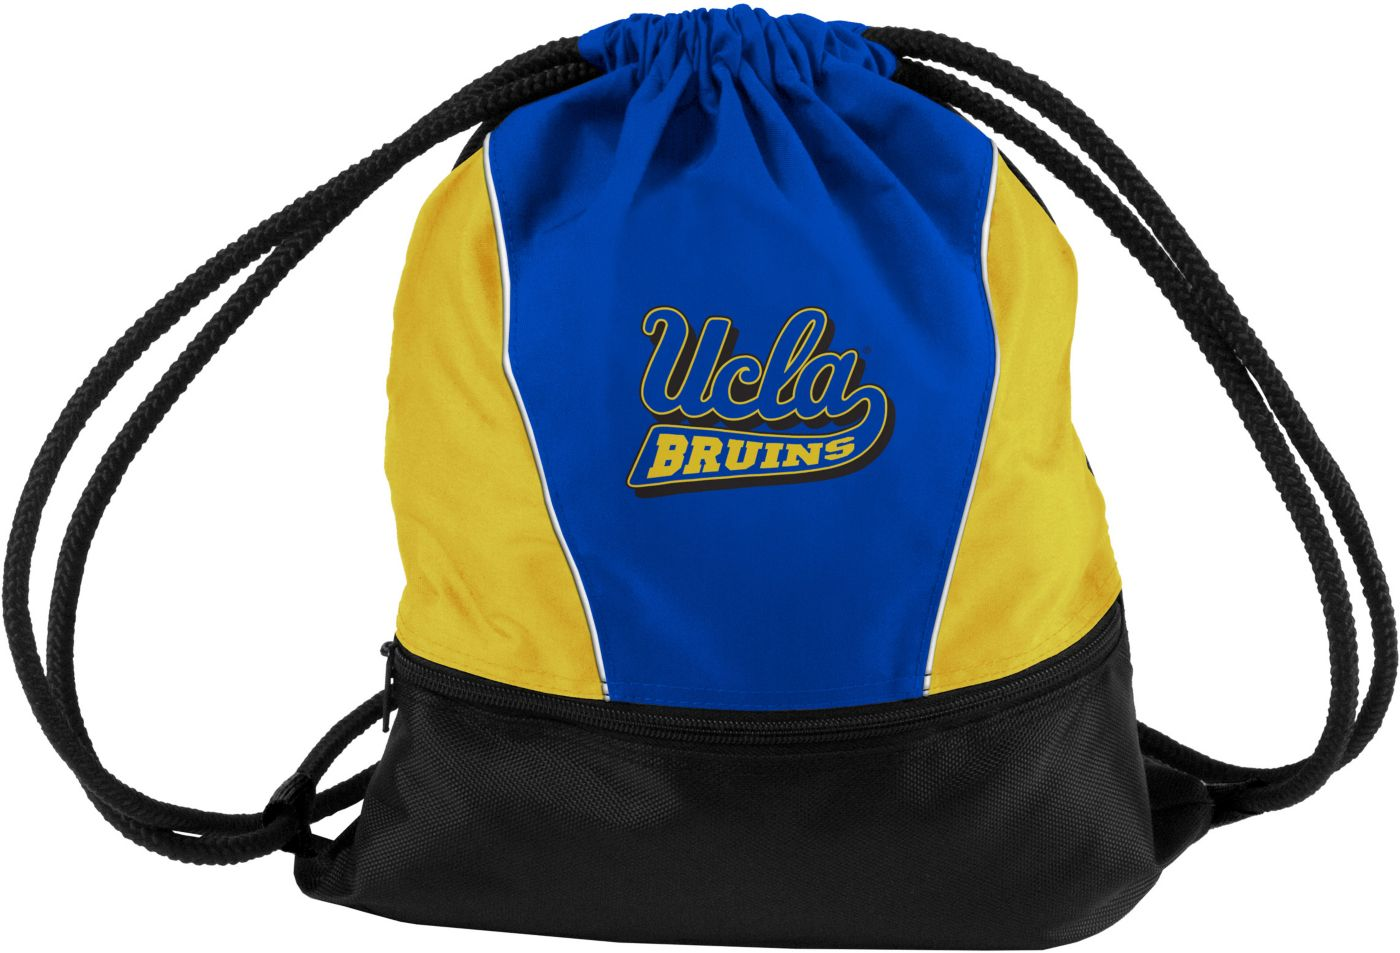 UCLA Bruins Sprint Pack